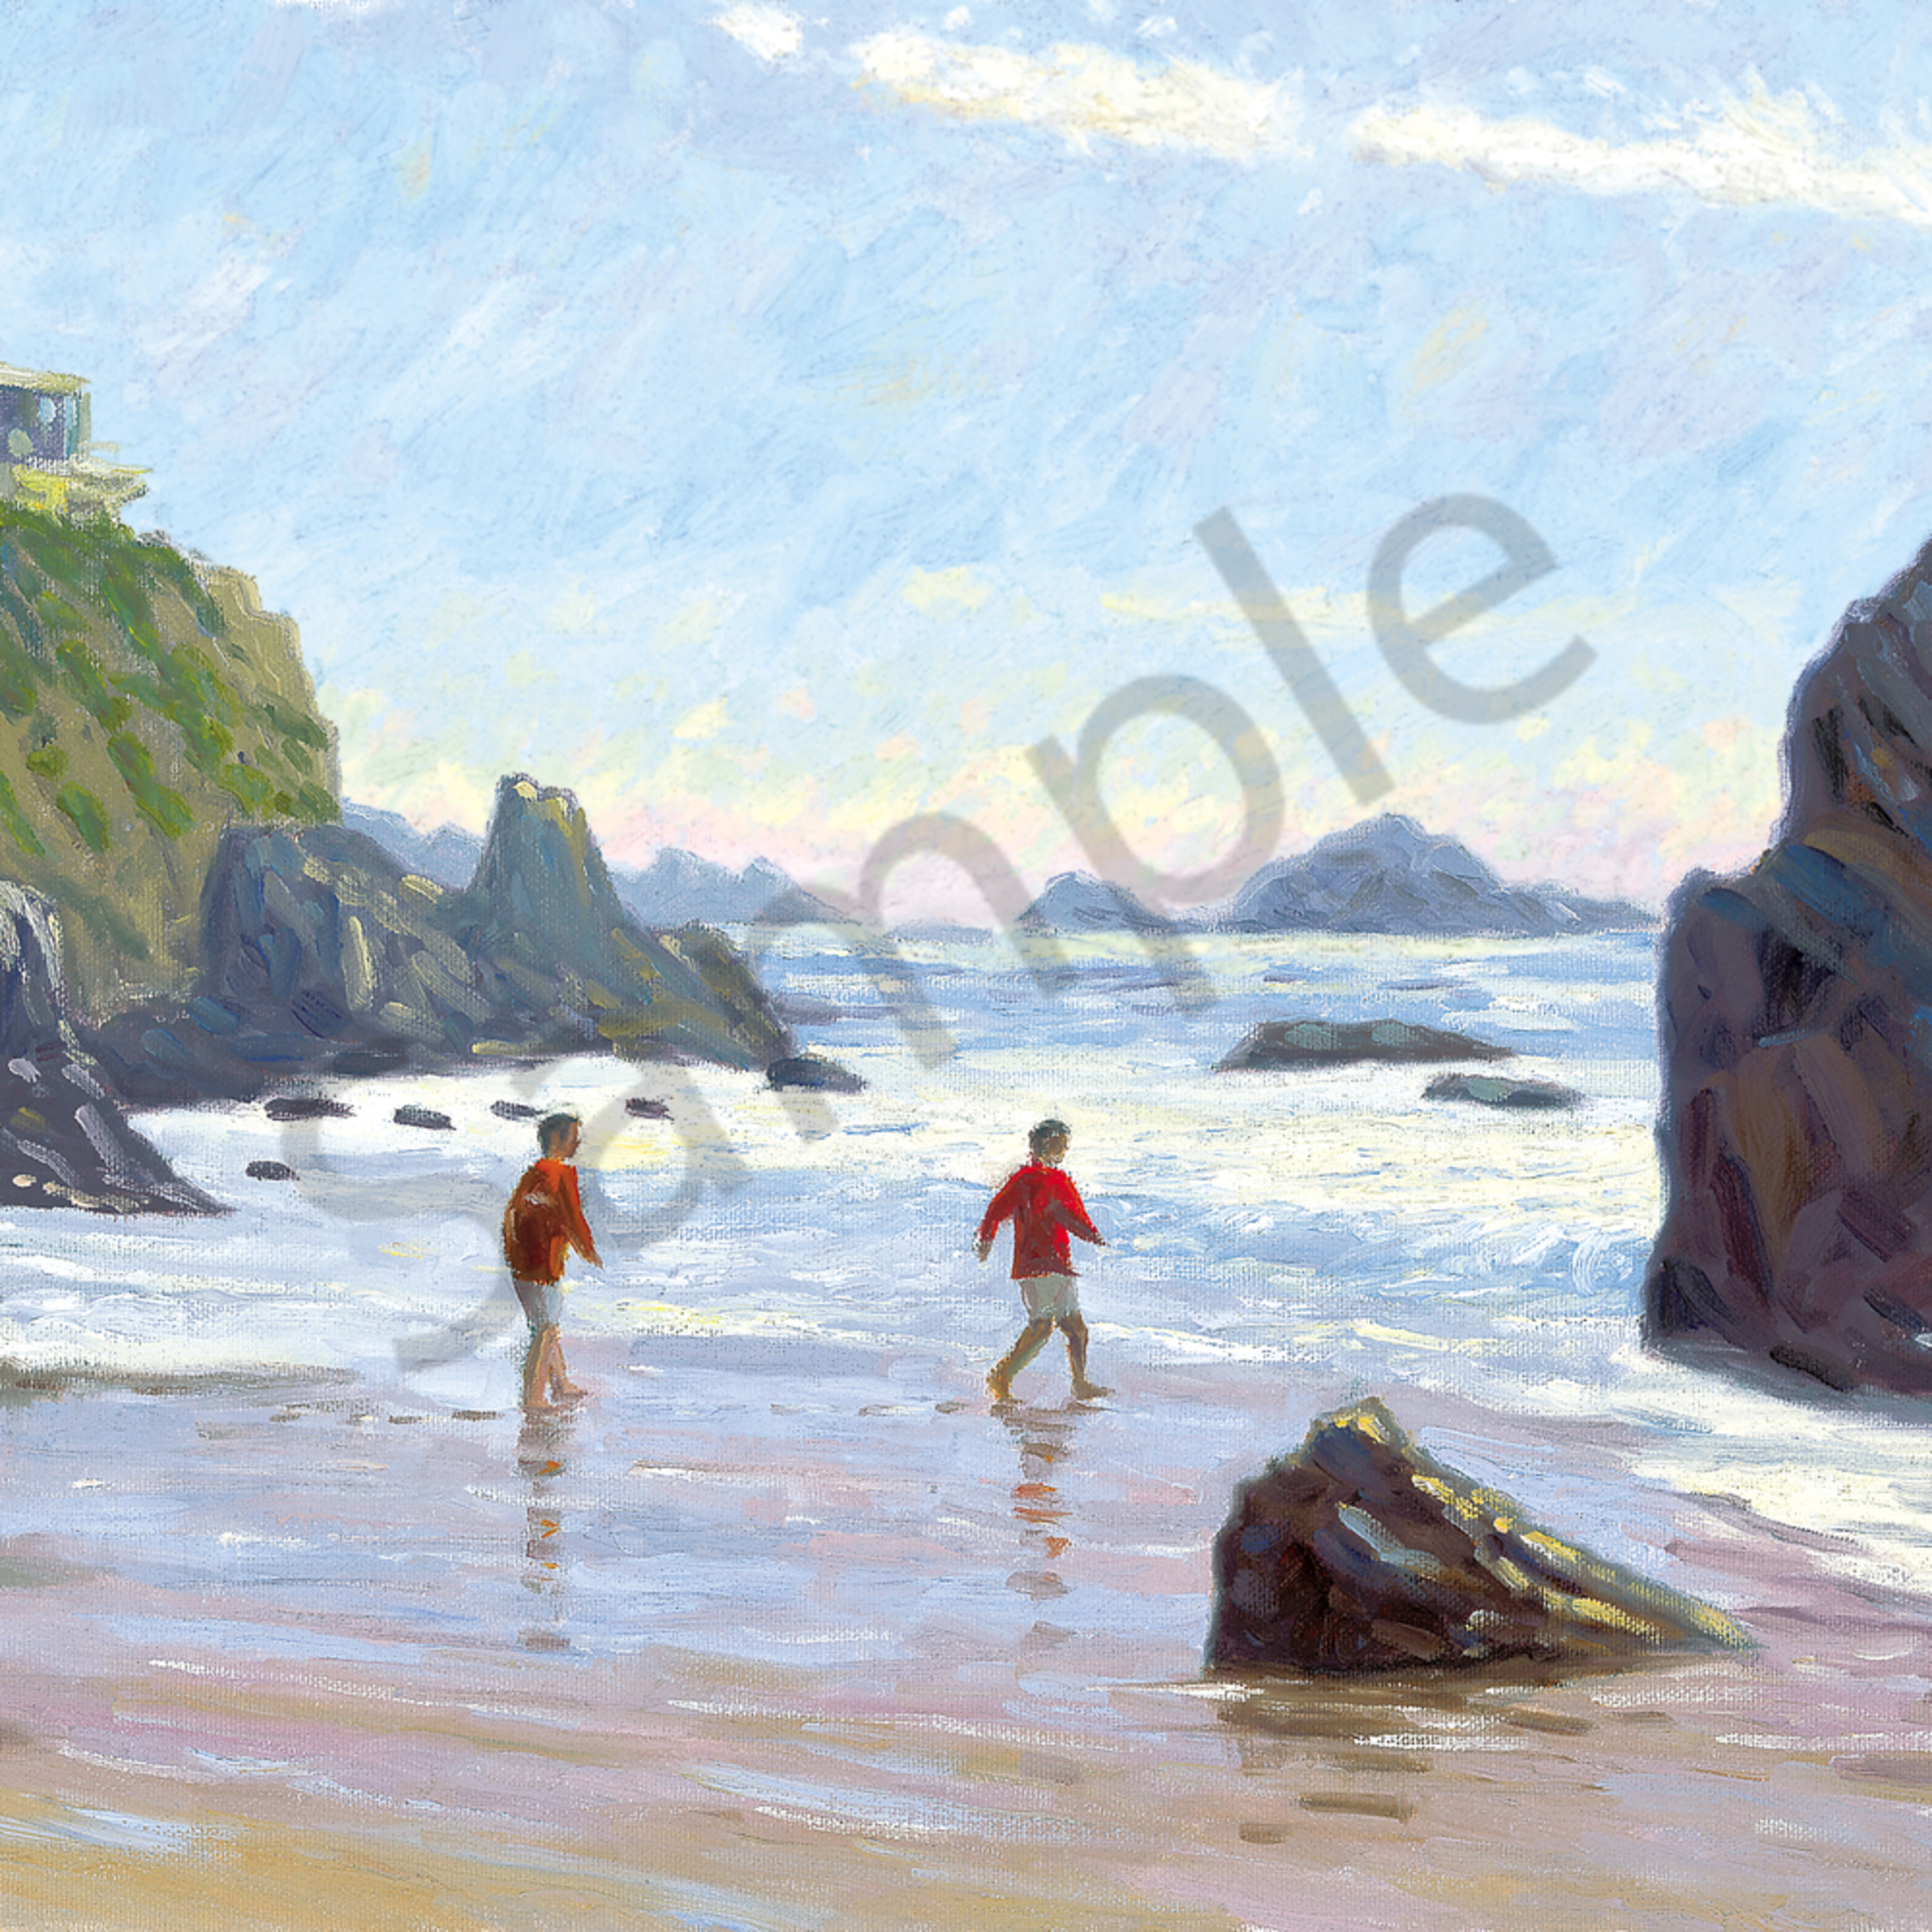 Kids on beach cdm acmm1m